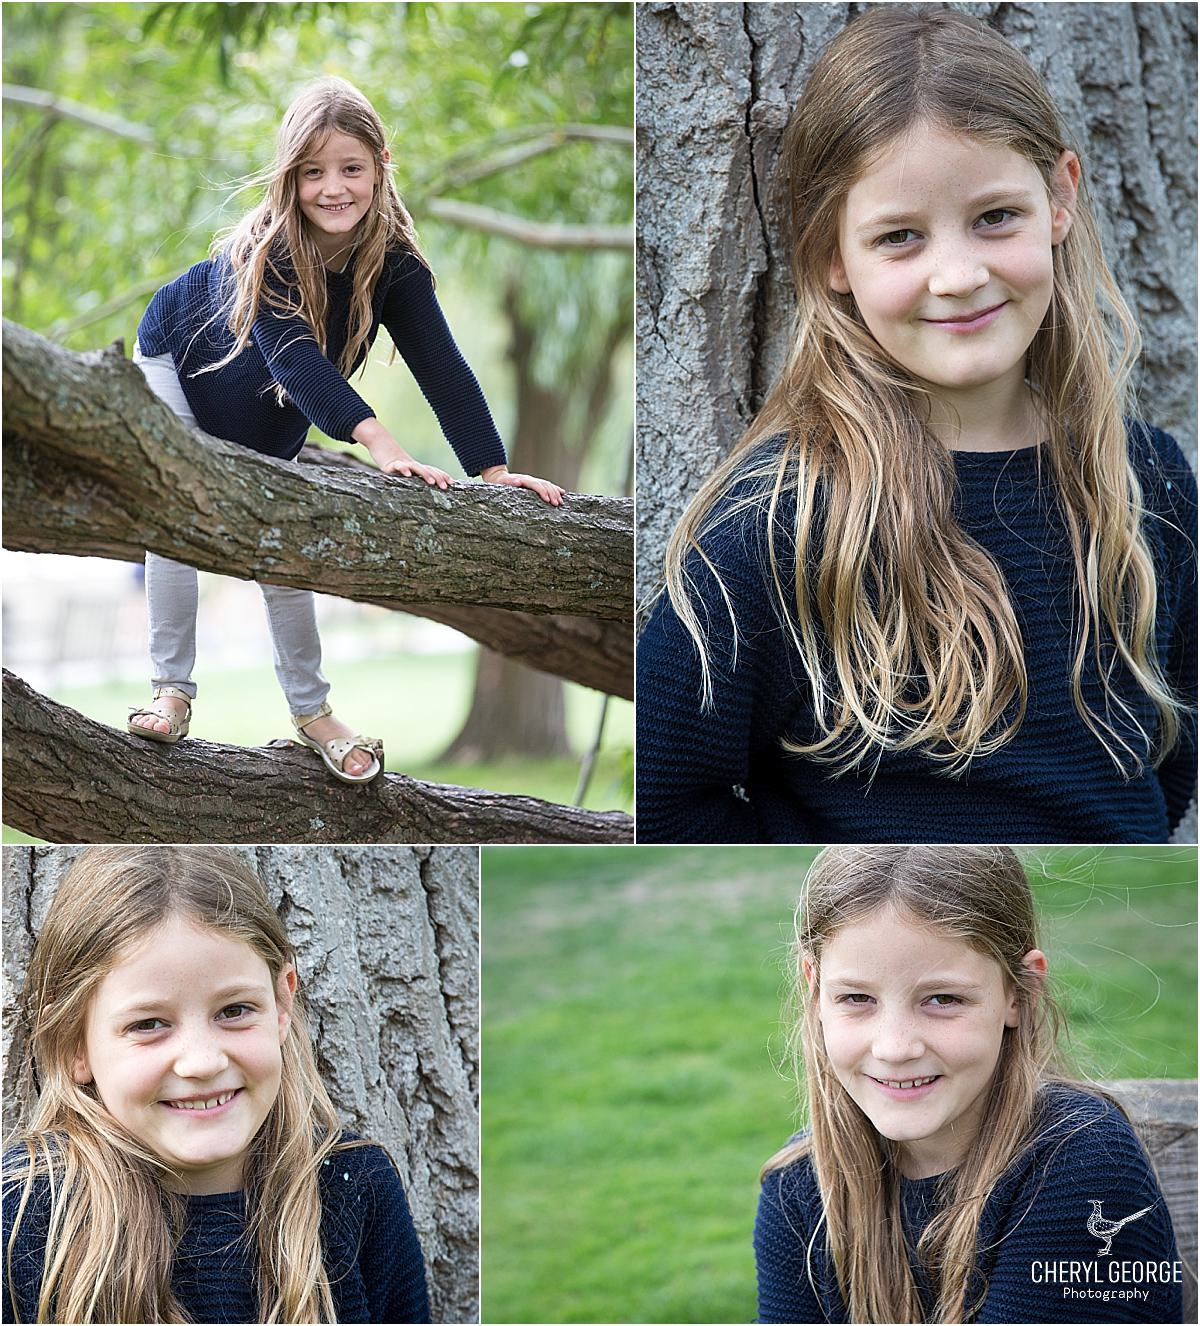 henley family photoshoot